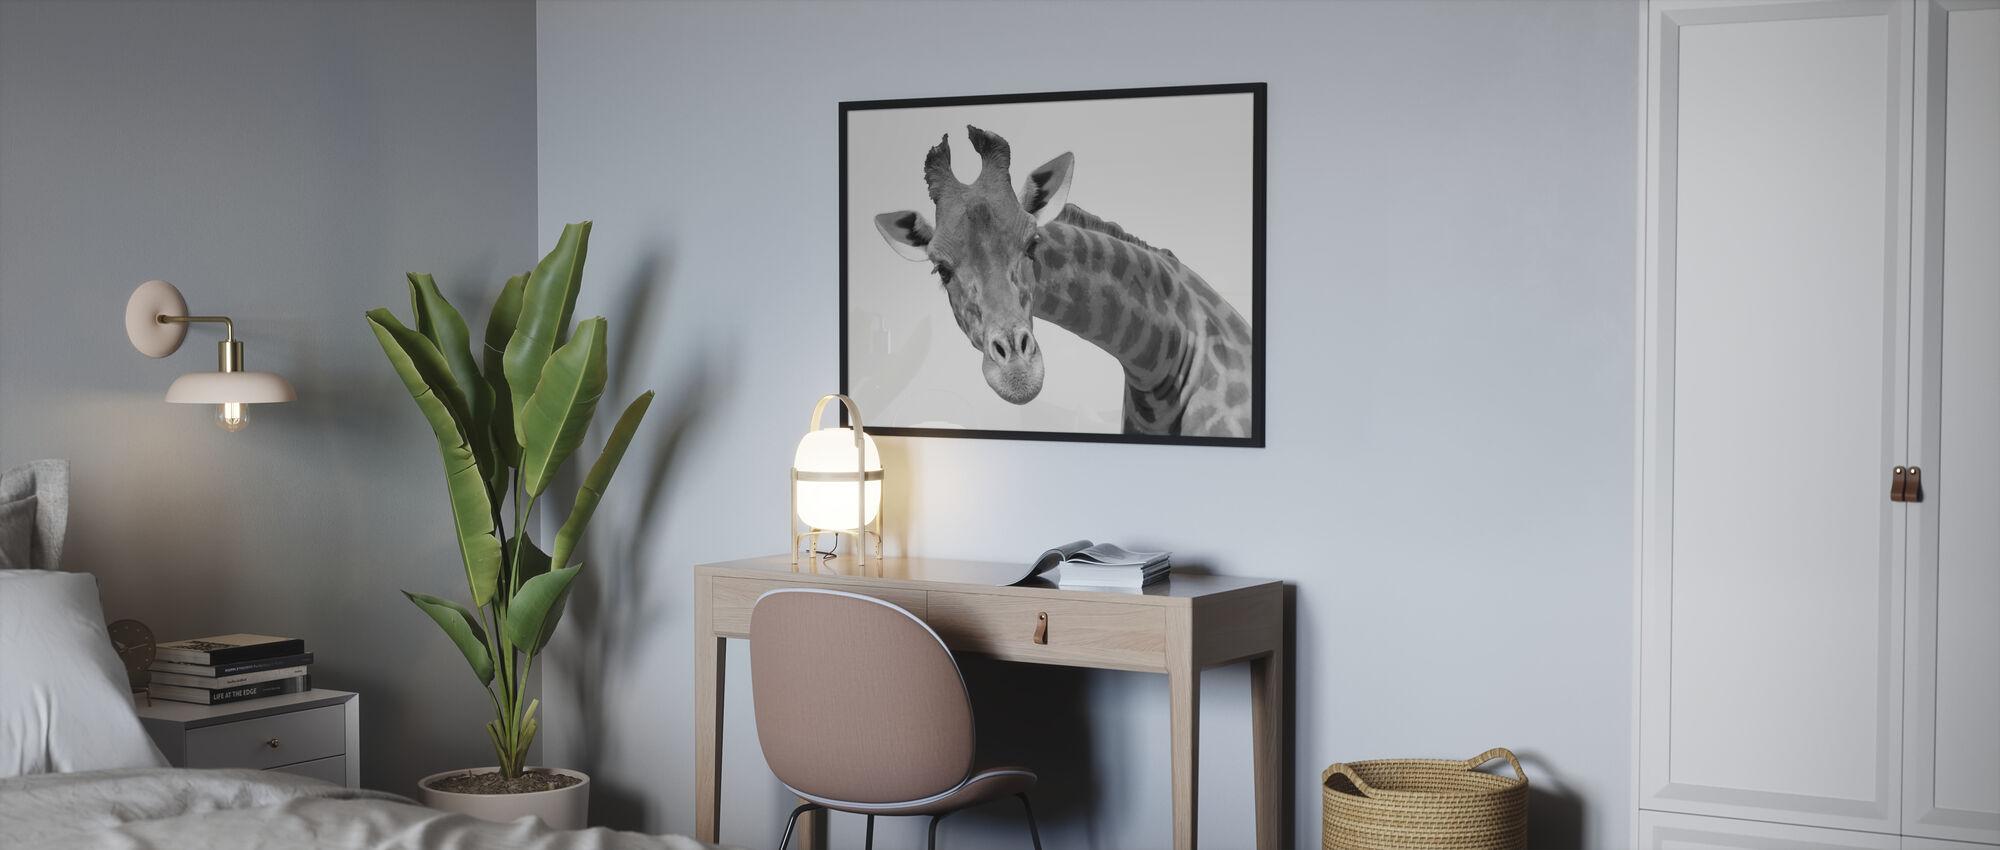 Giraffe - Poster - Bedroom